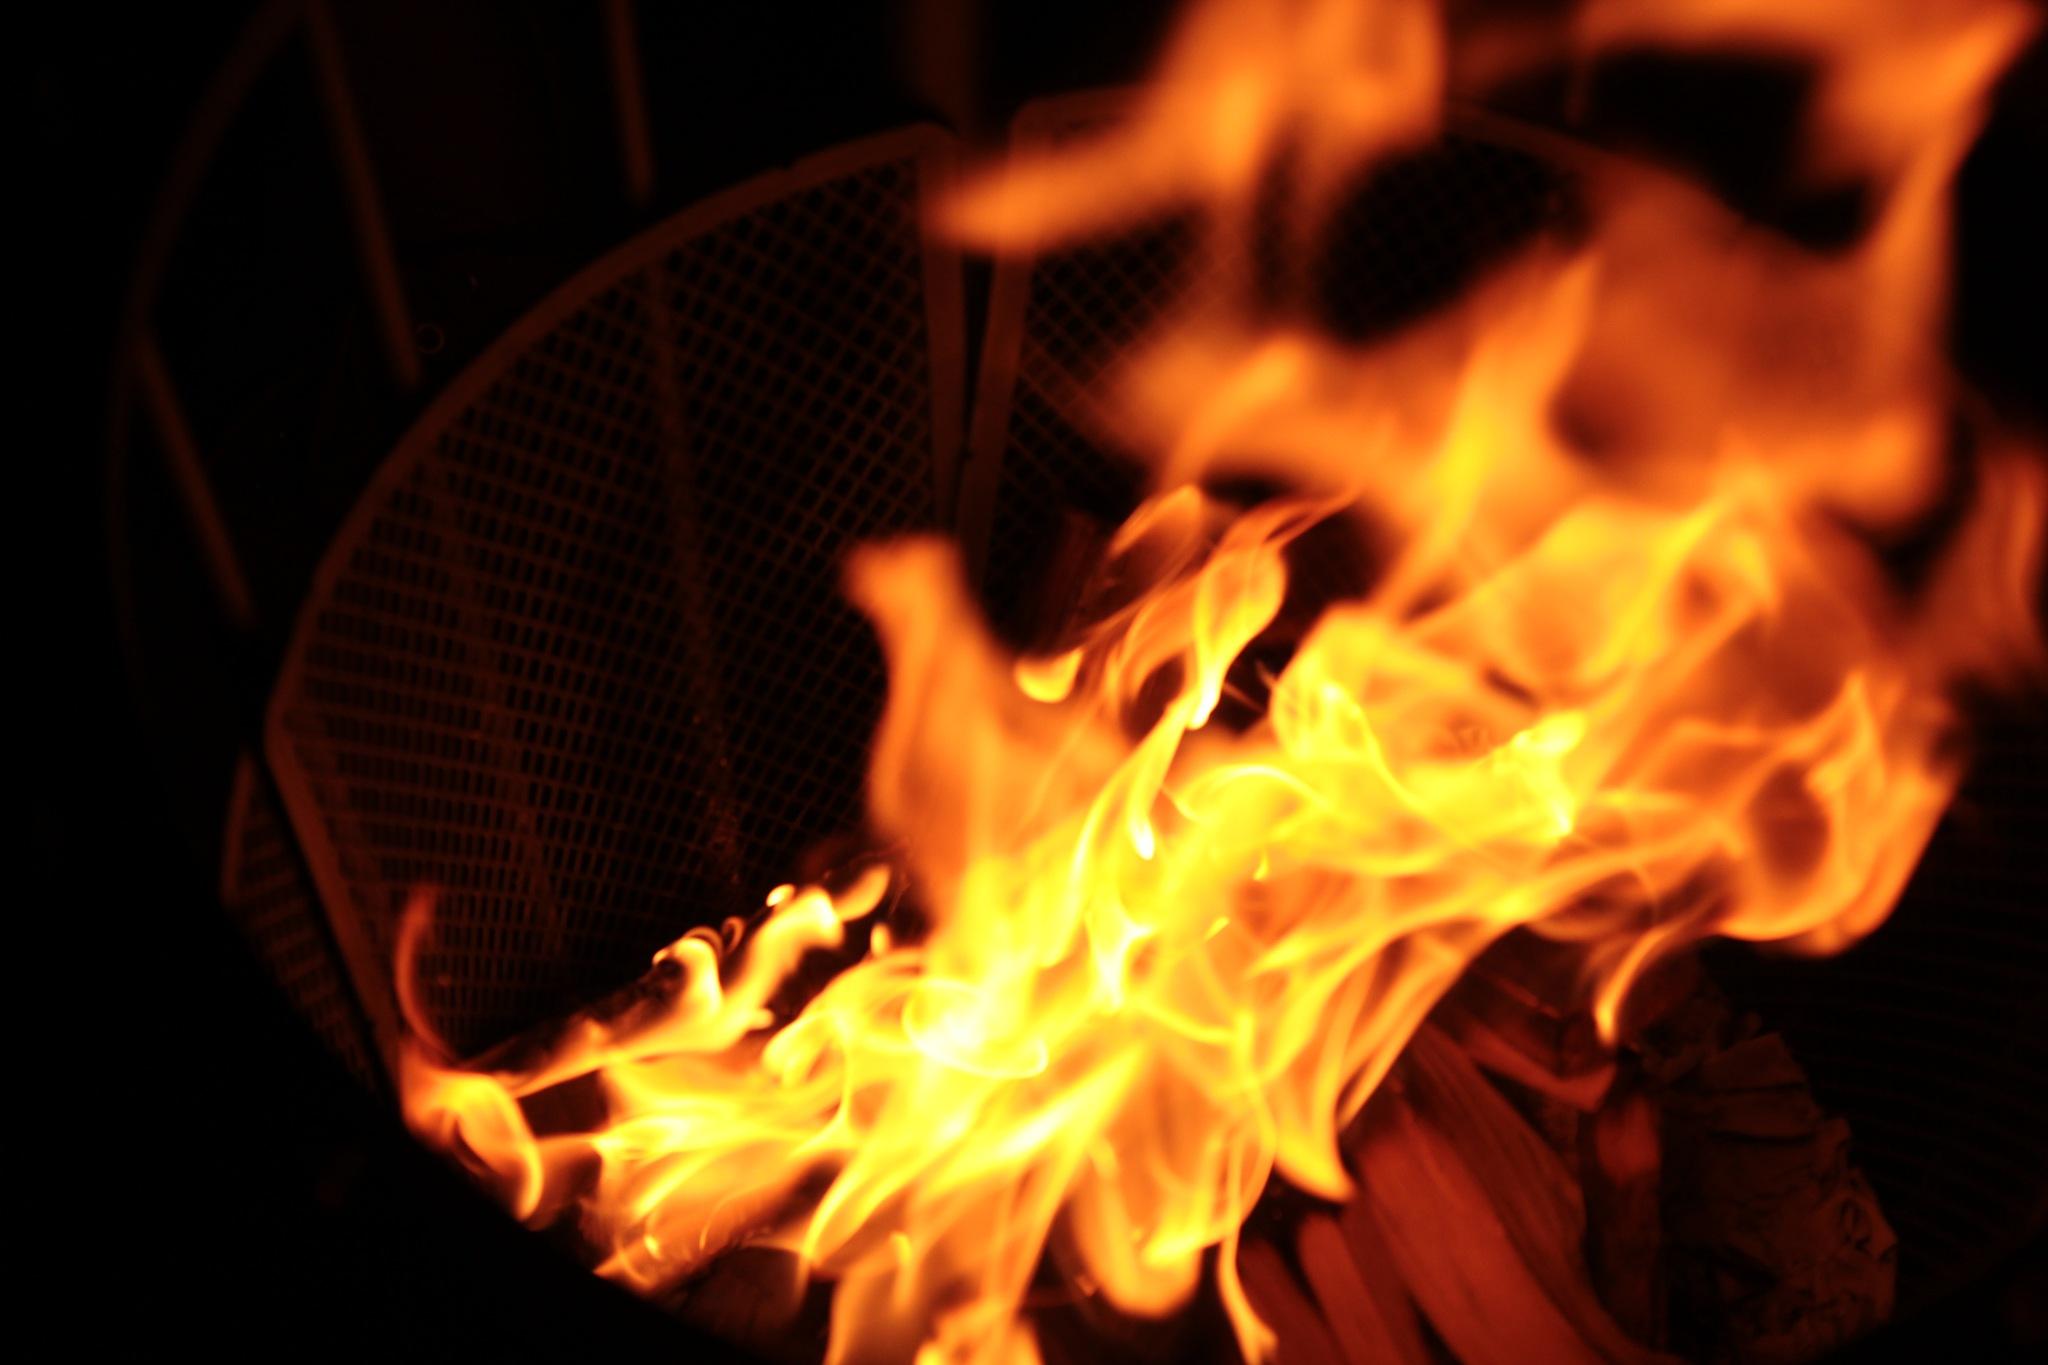 Fire by Sarah Johnson